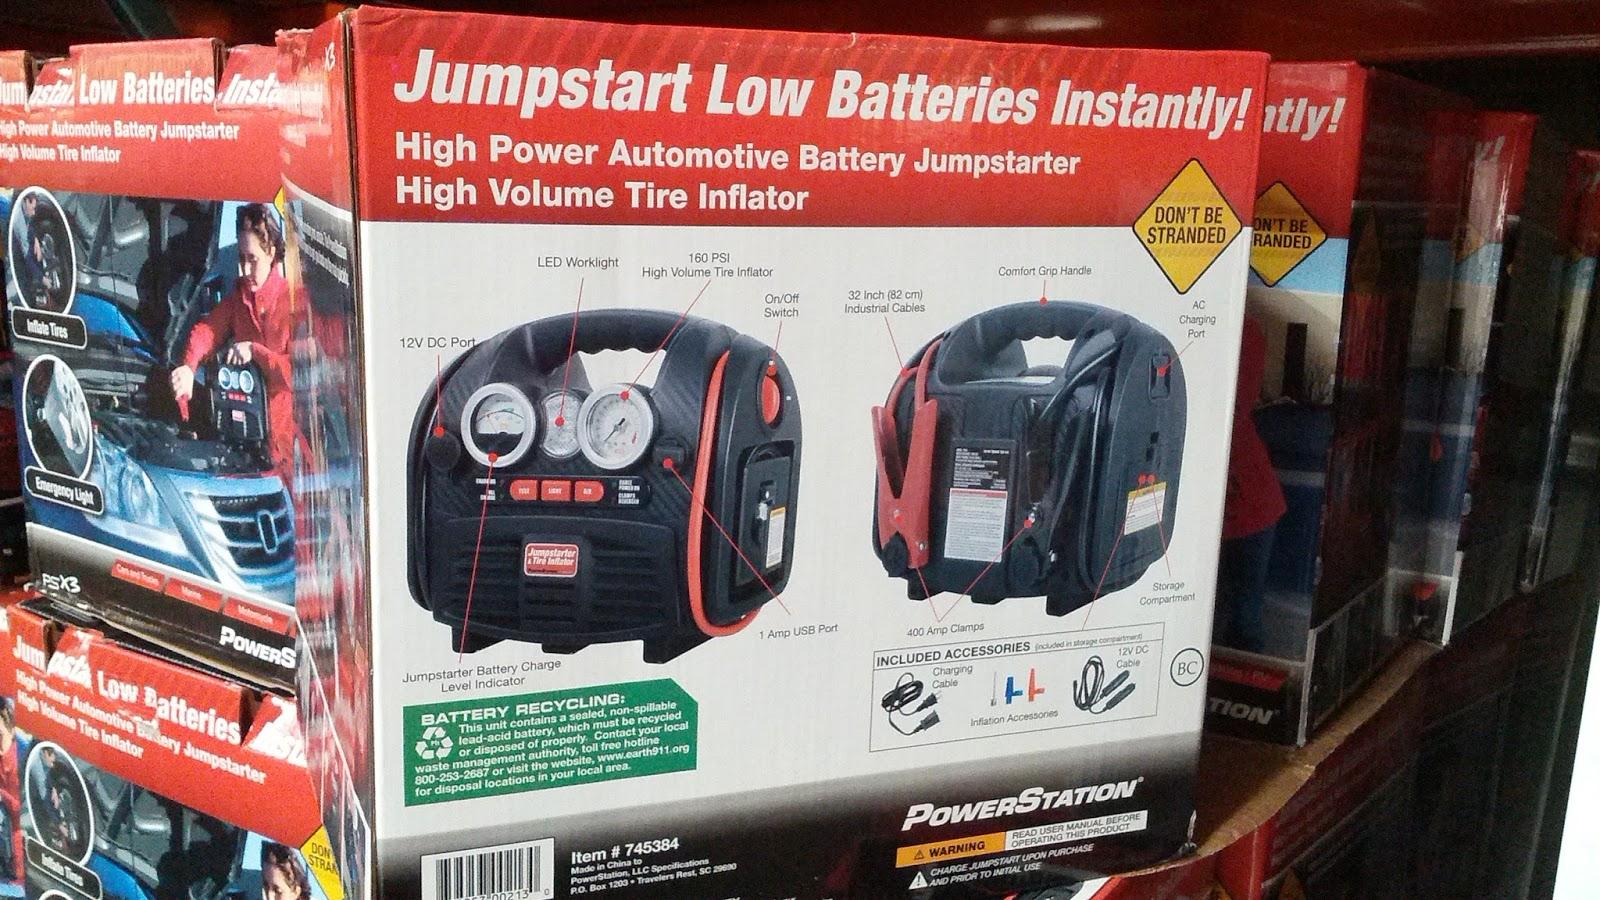 Powerstation Psx3 Battery Jump Starter Portable Power Source And